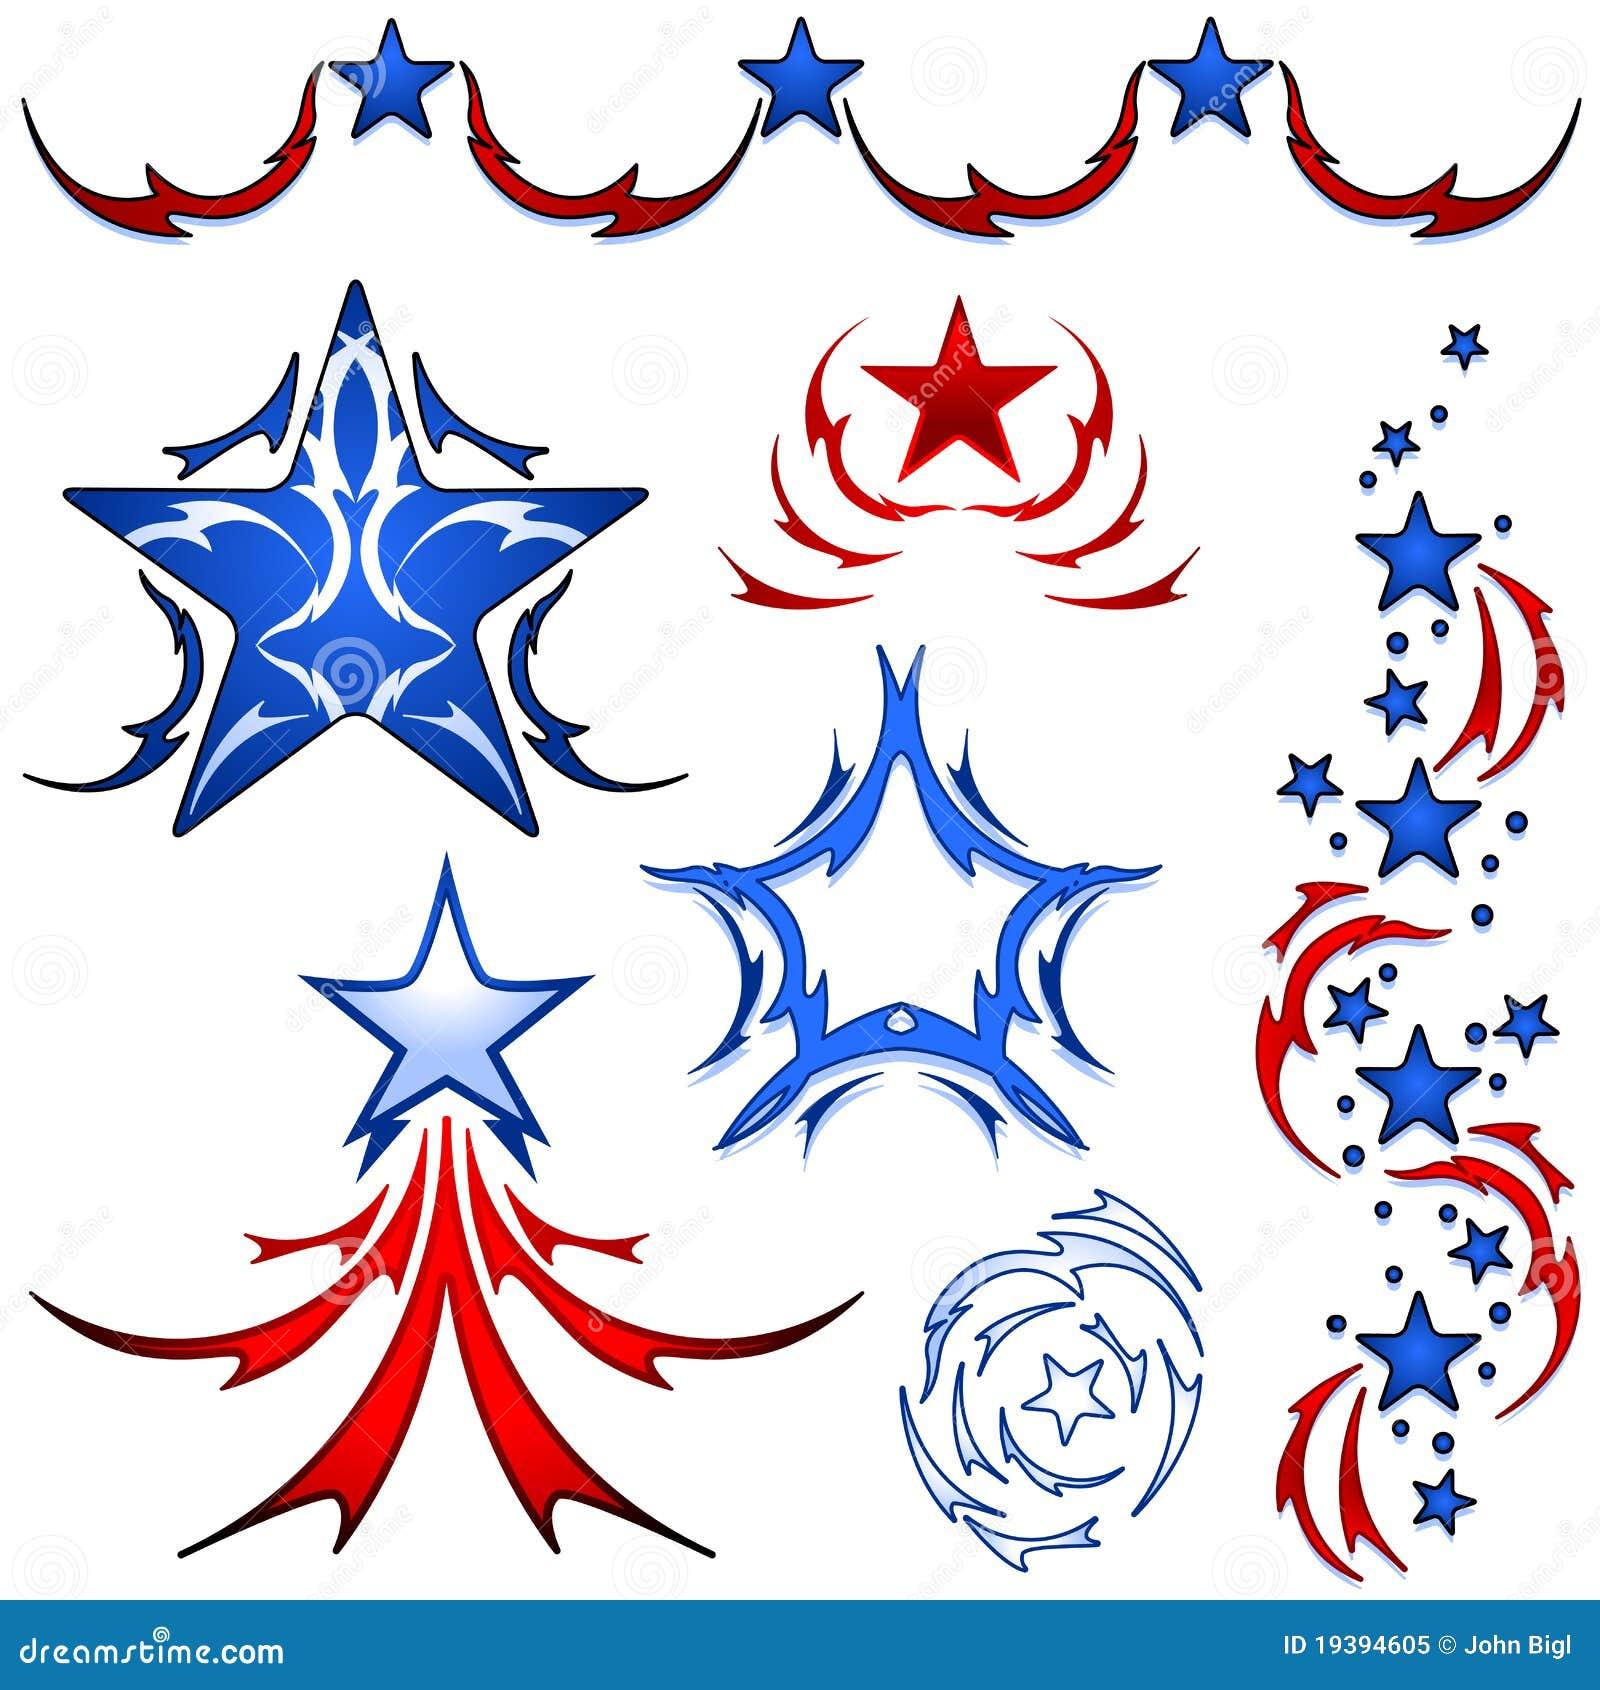 America Tattoo Designs Royalty Free Stock Photo